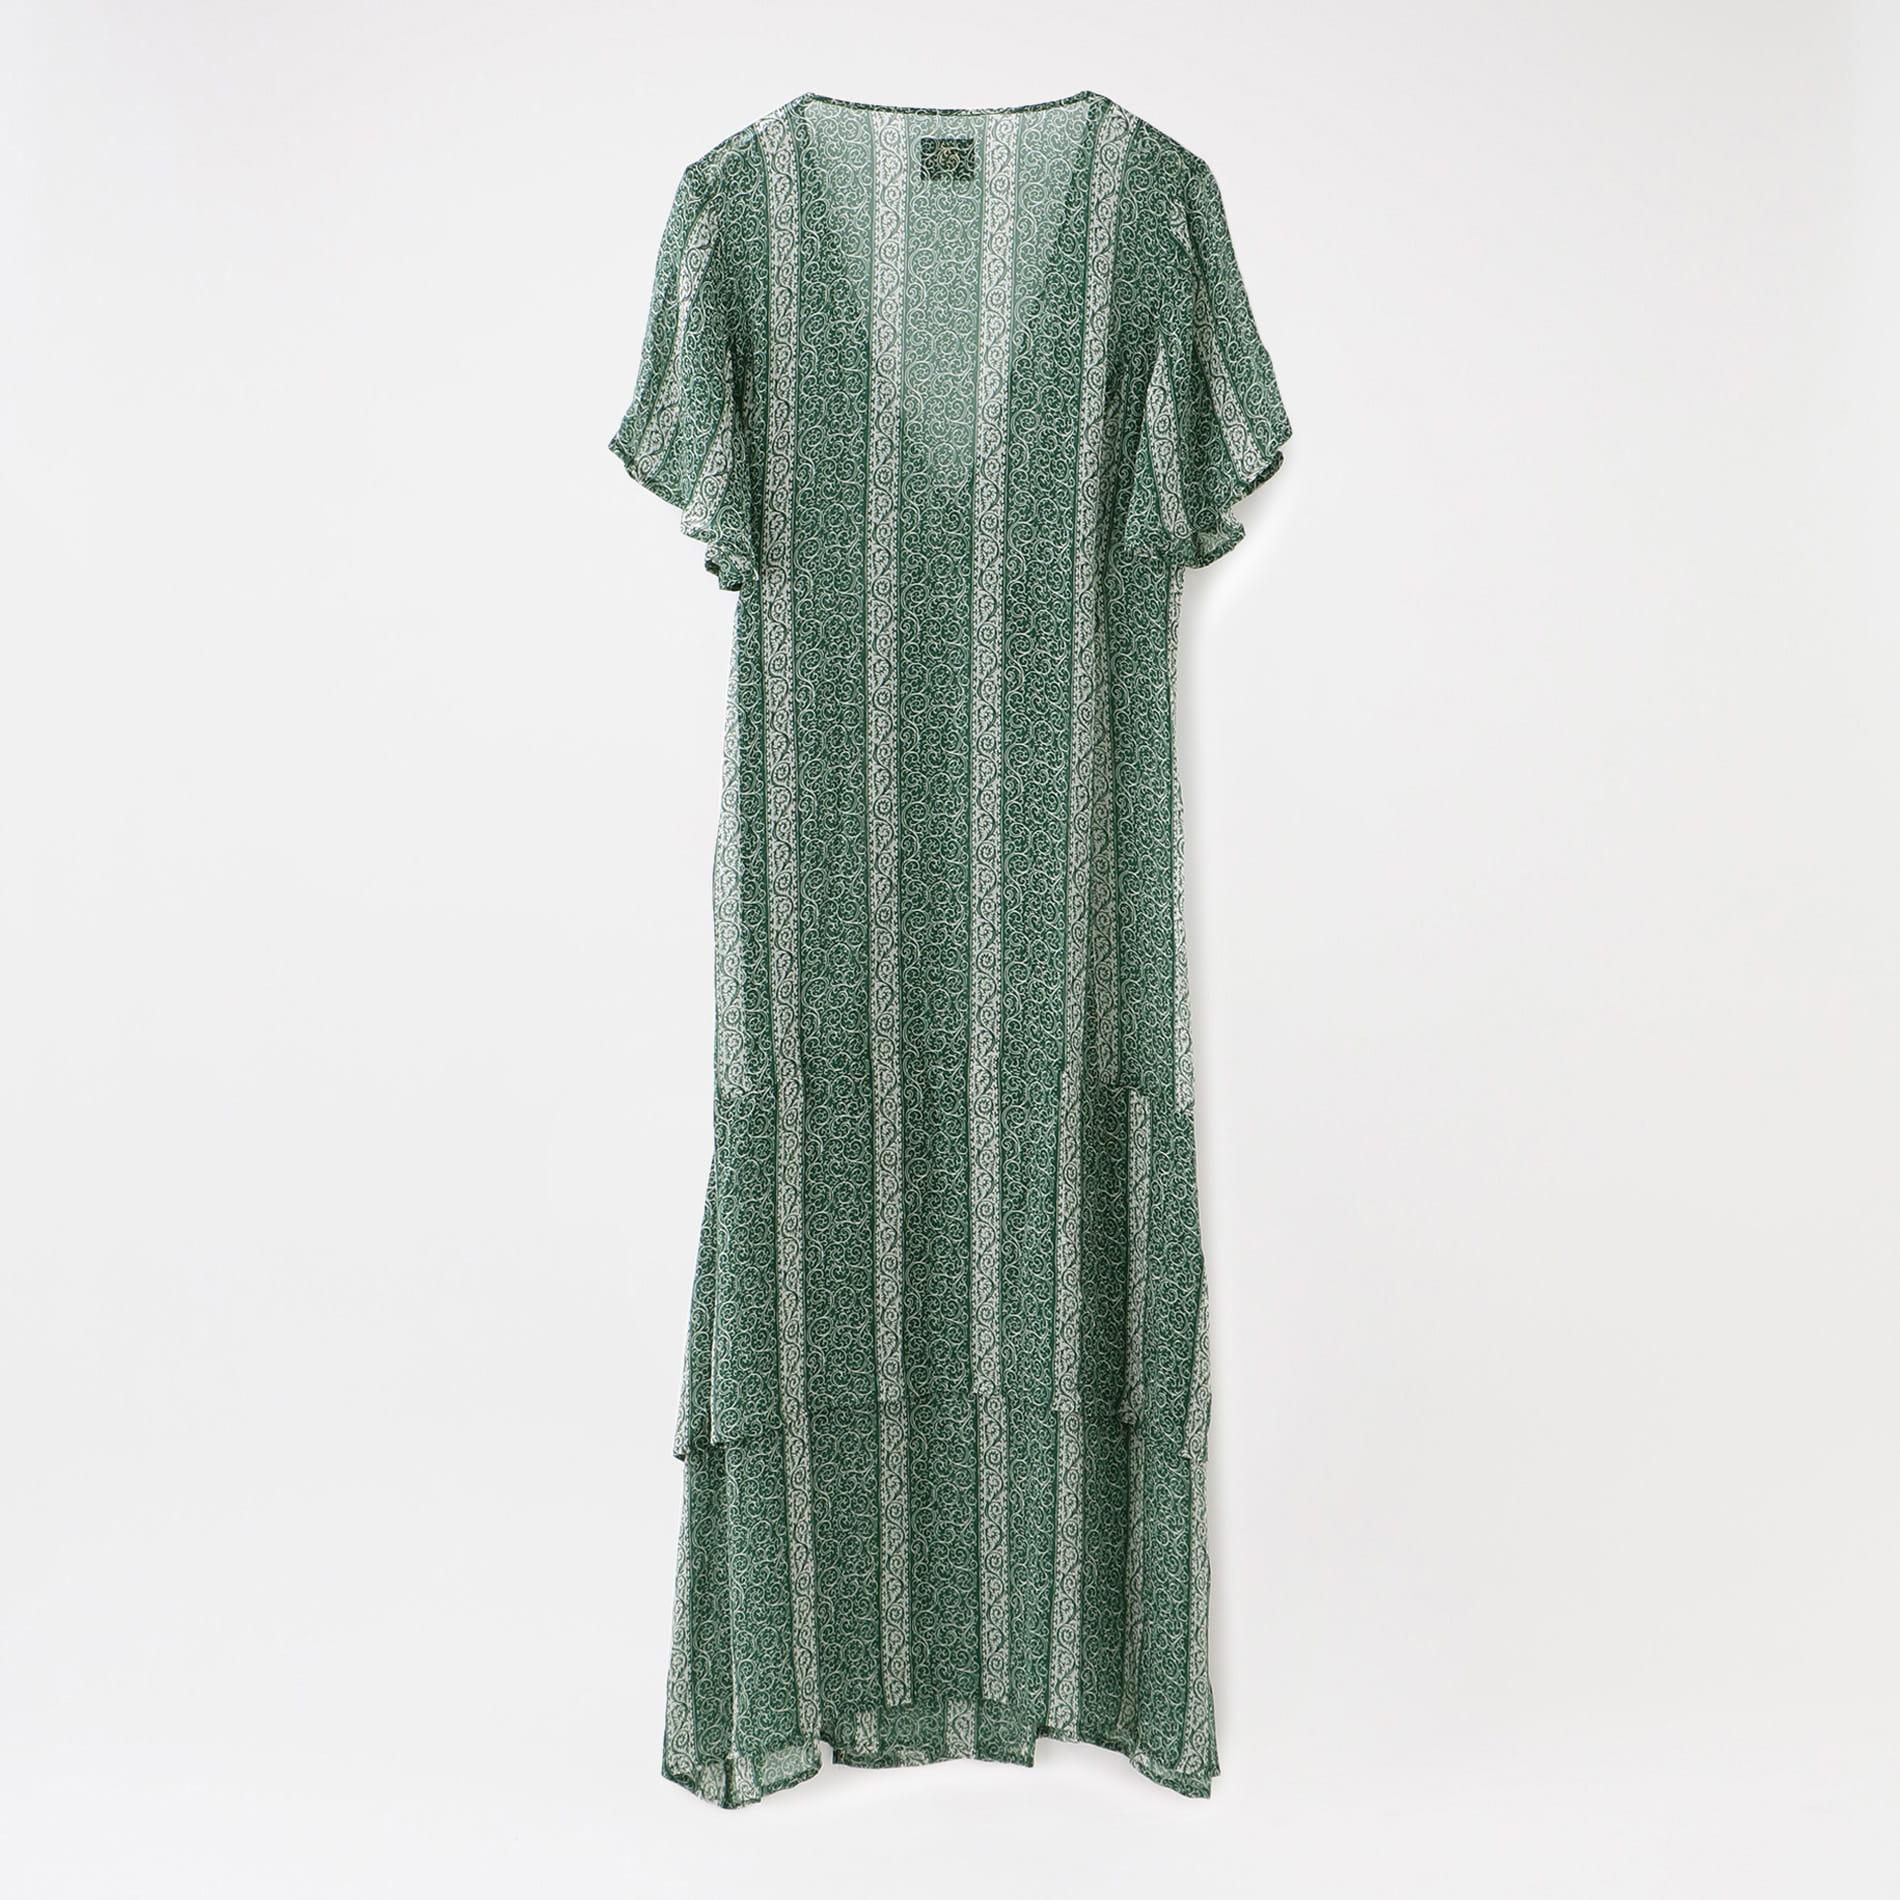 【Needles】WOMEN ワンピース Wrap Dress - Cupra Chiffon / Pt. IN077